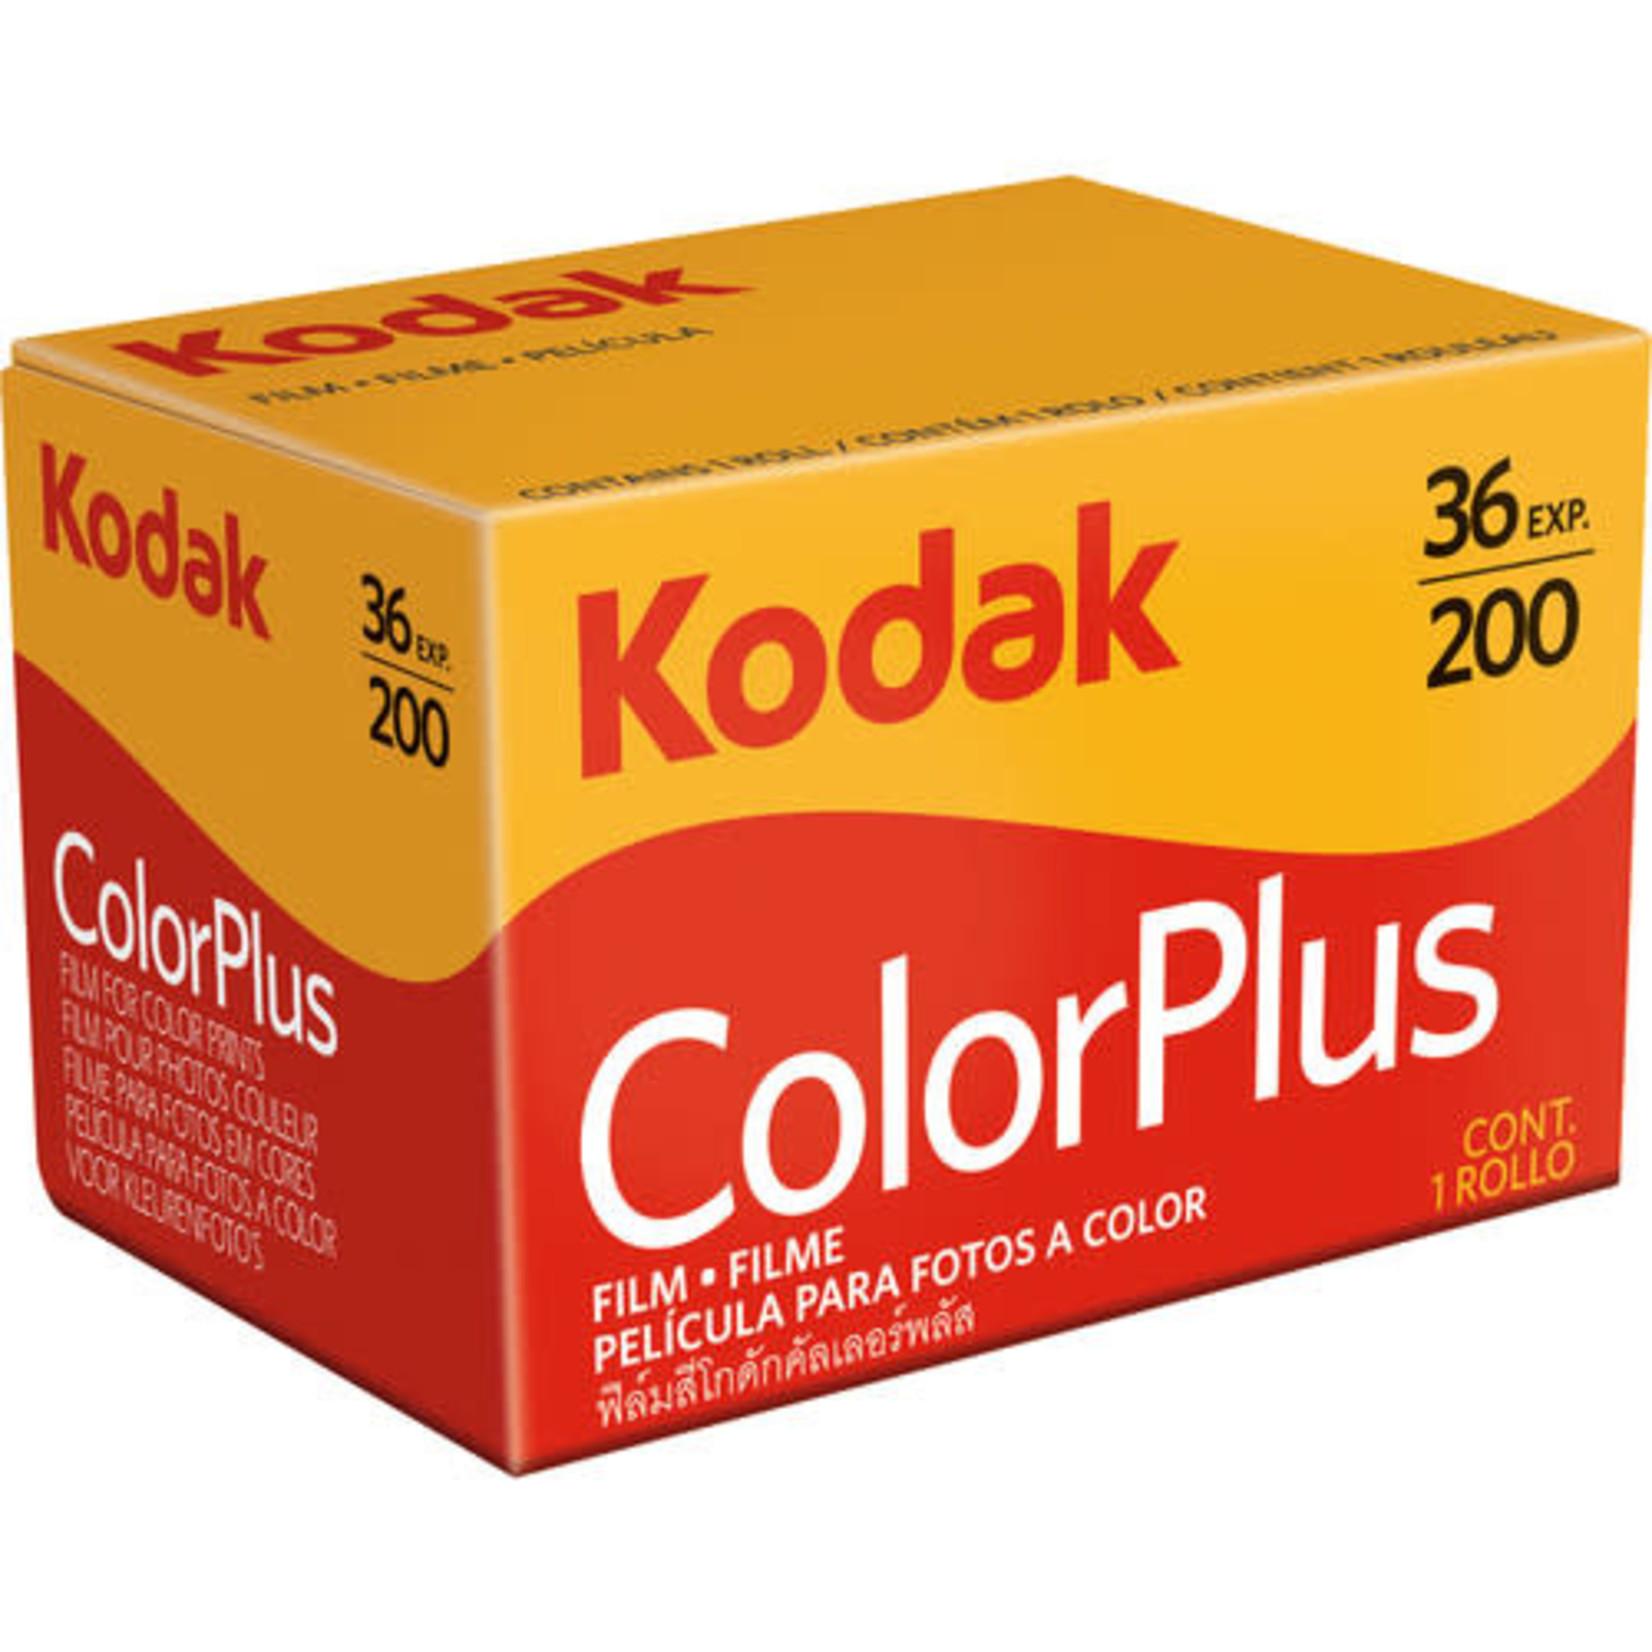 Kodak Kodak ColorPlus 200 Color Negative Film (35mm Roll Film, 36 Exposures)